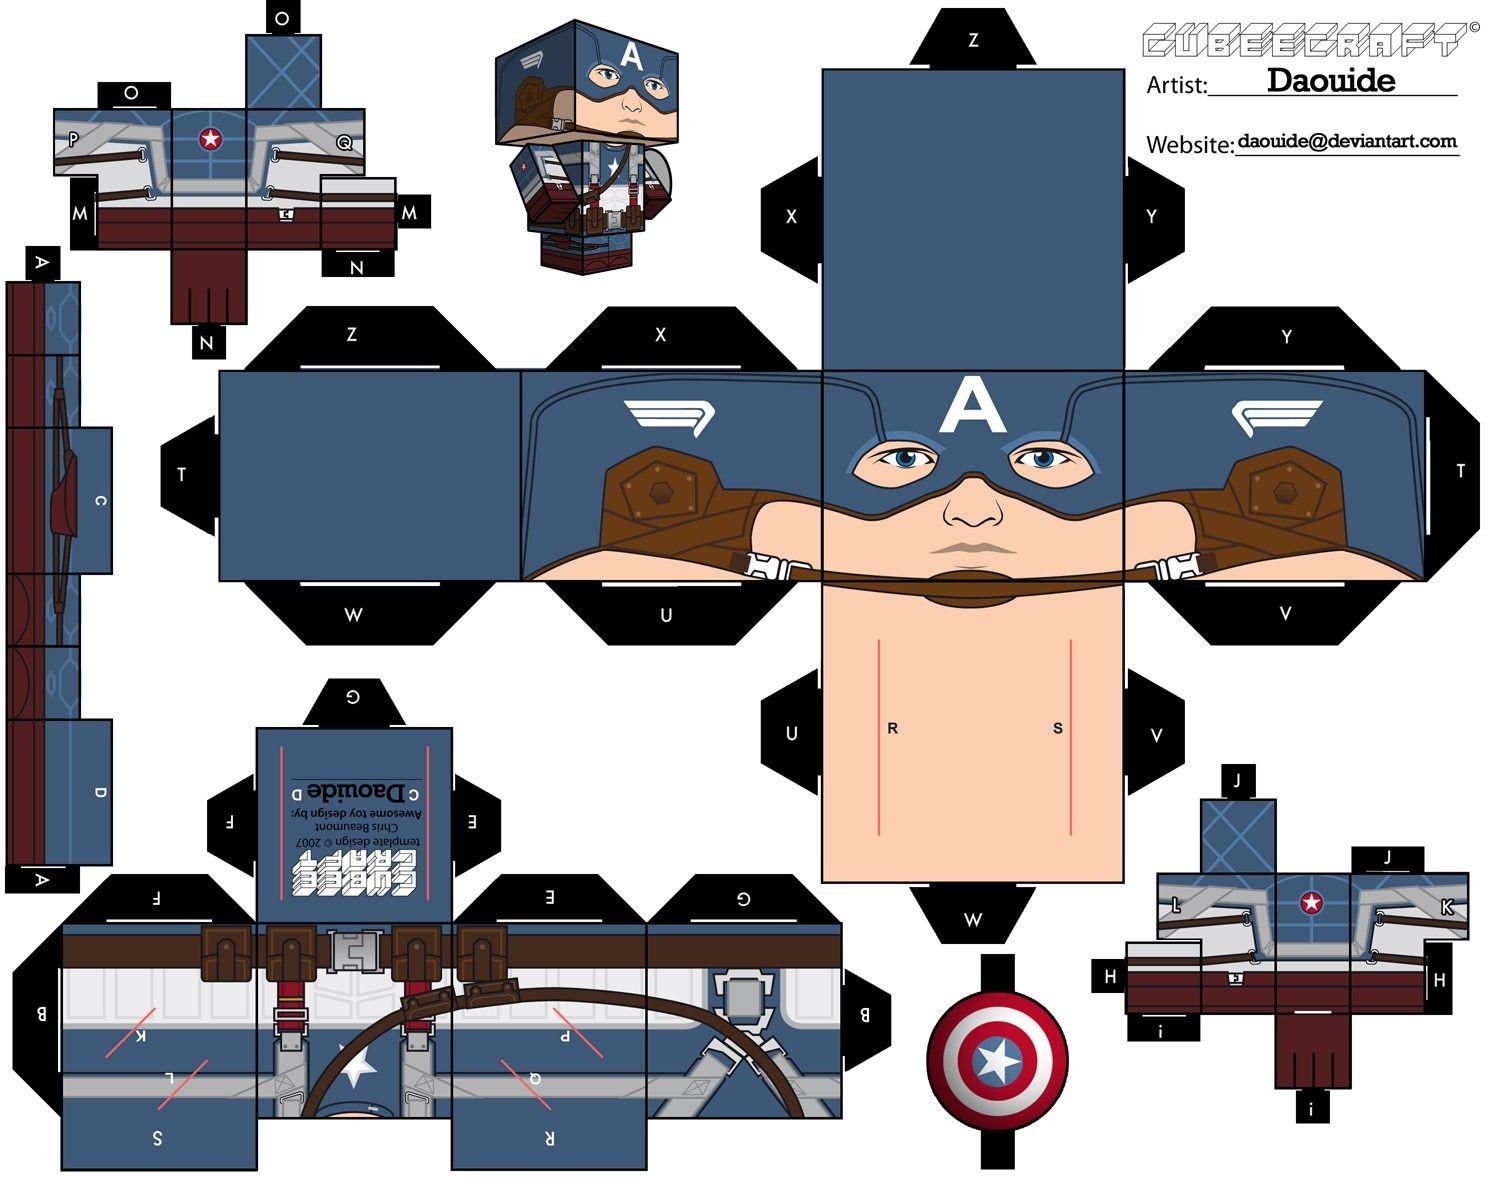 Minecraft Papercraft Cape Megapost] Papercraft Tus Personajes Preferidos En Papel